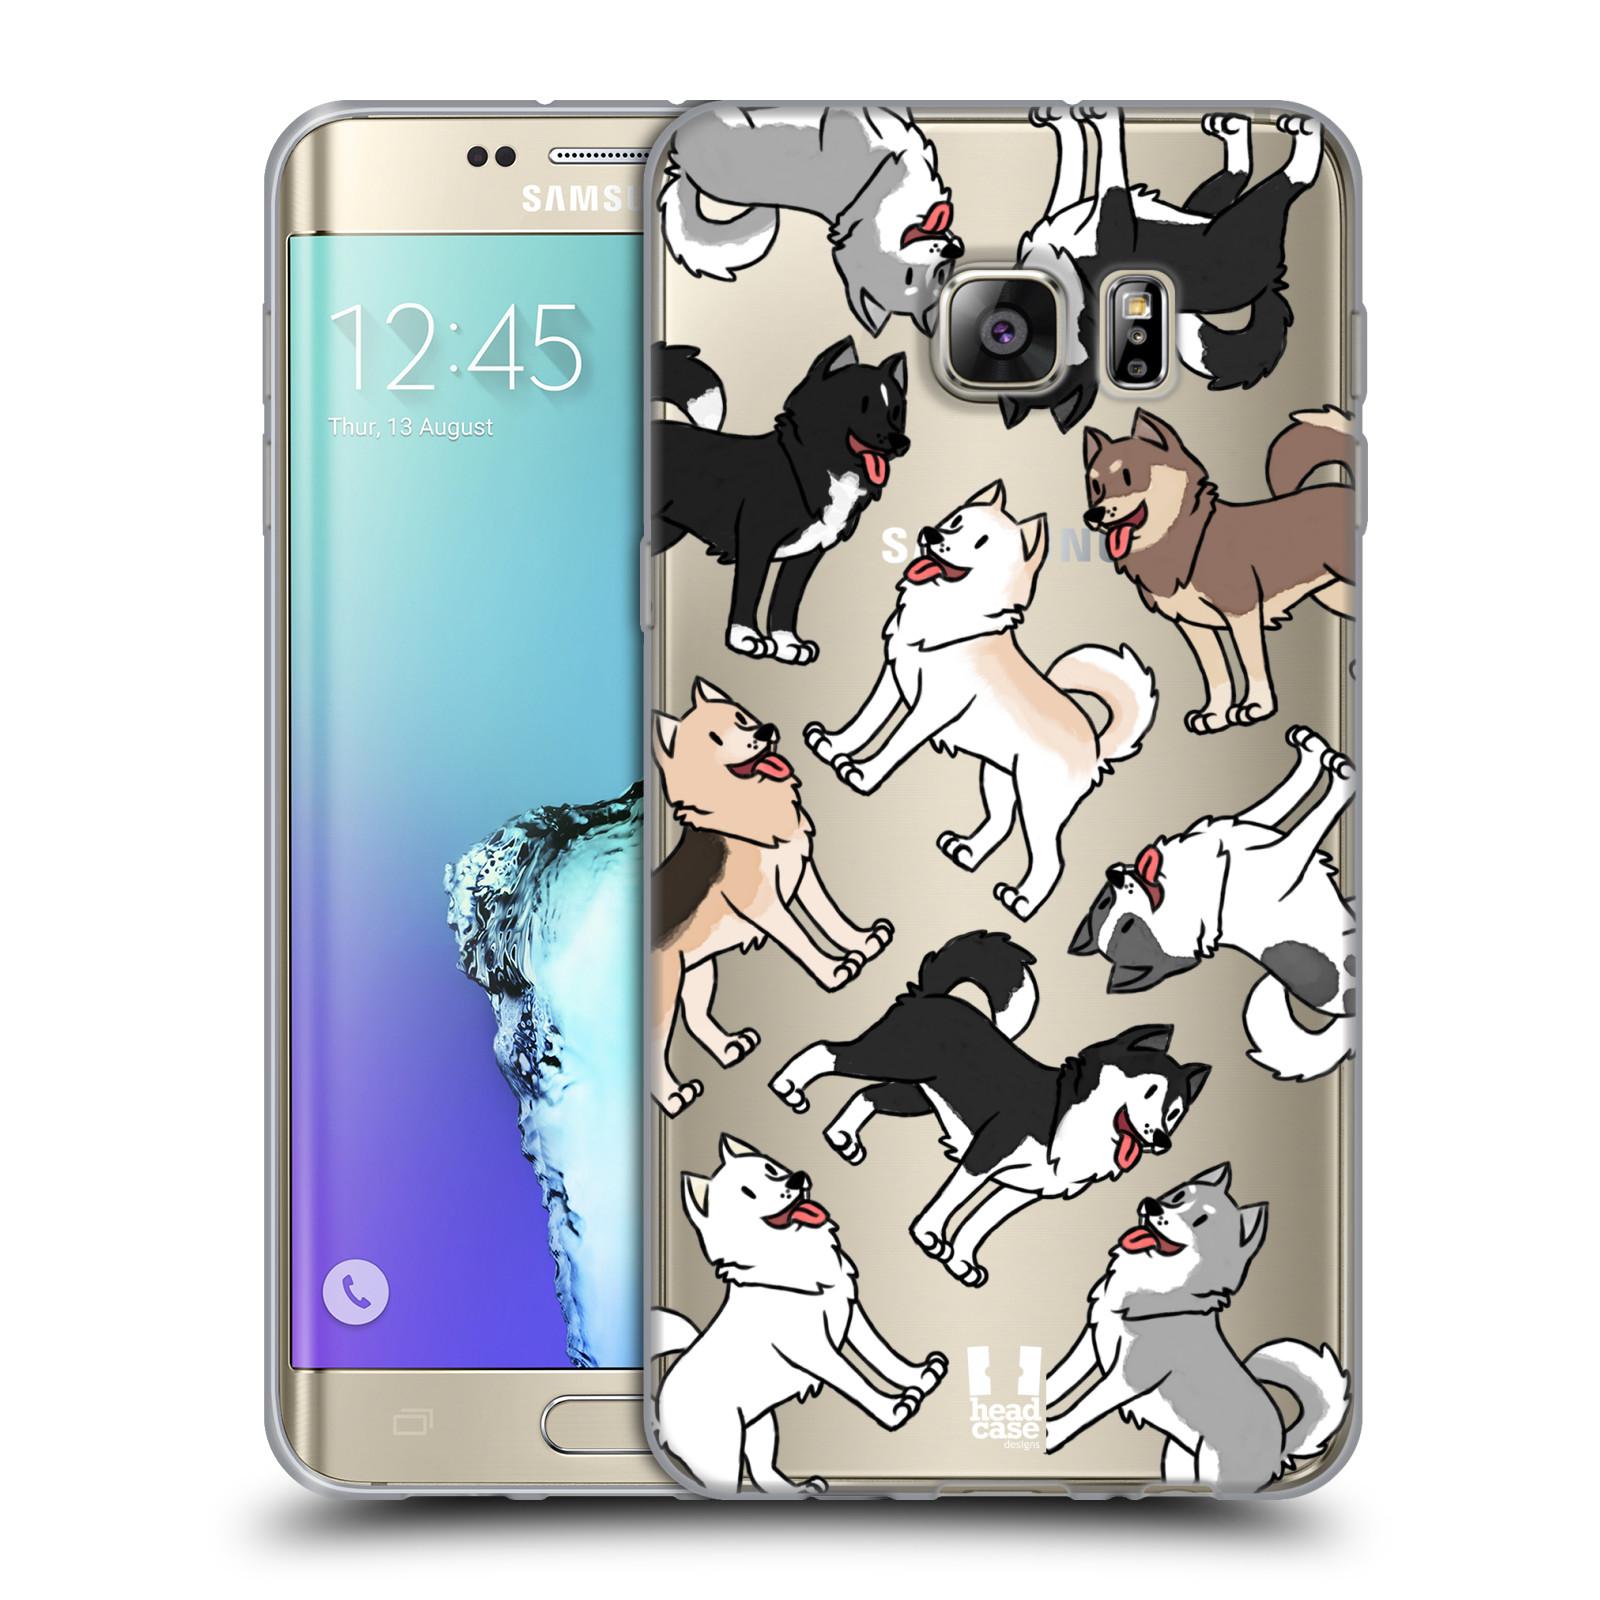 HEAD CASE silikonový obal na mobil Samsung Galaxy S6 EDGE PLUS pejsek Sibiřský husky